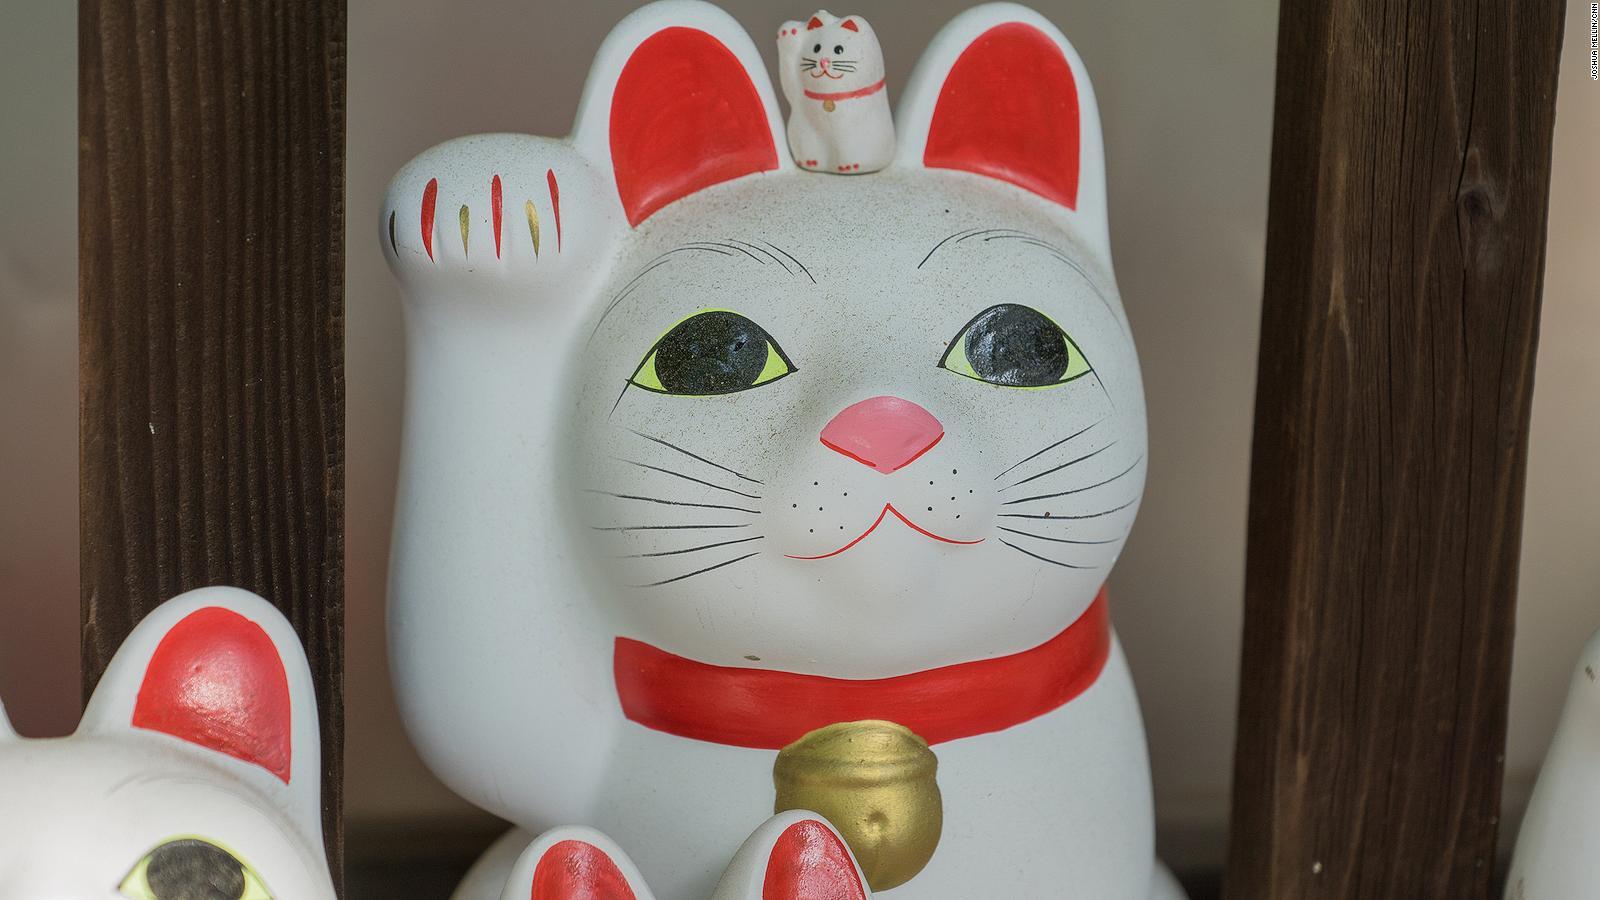 Maneki Neko The Waving Cats Tokyo Temple Of Origin Cnn Travel